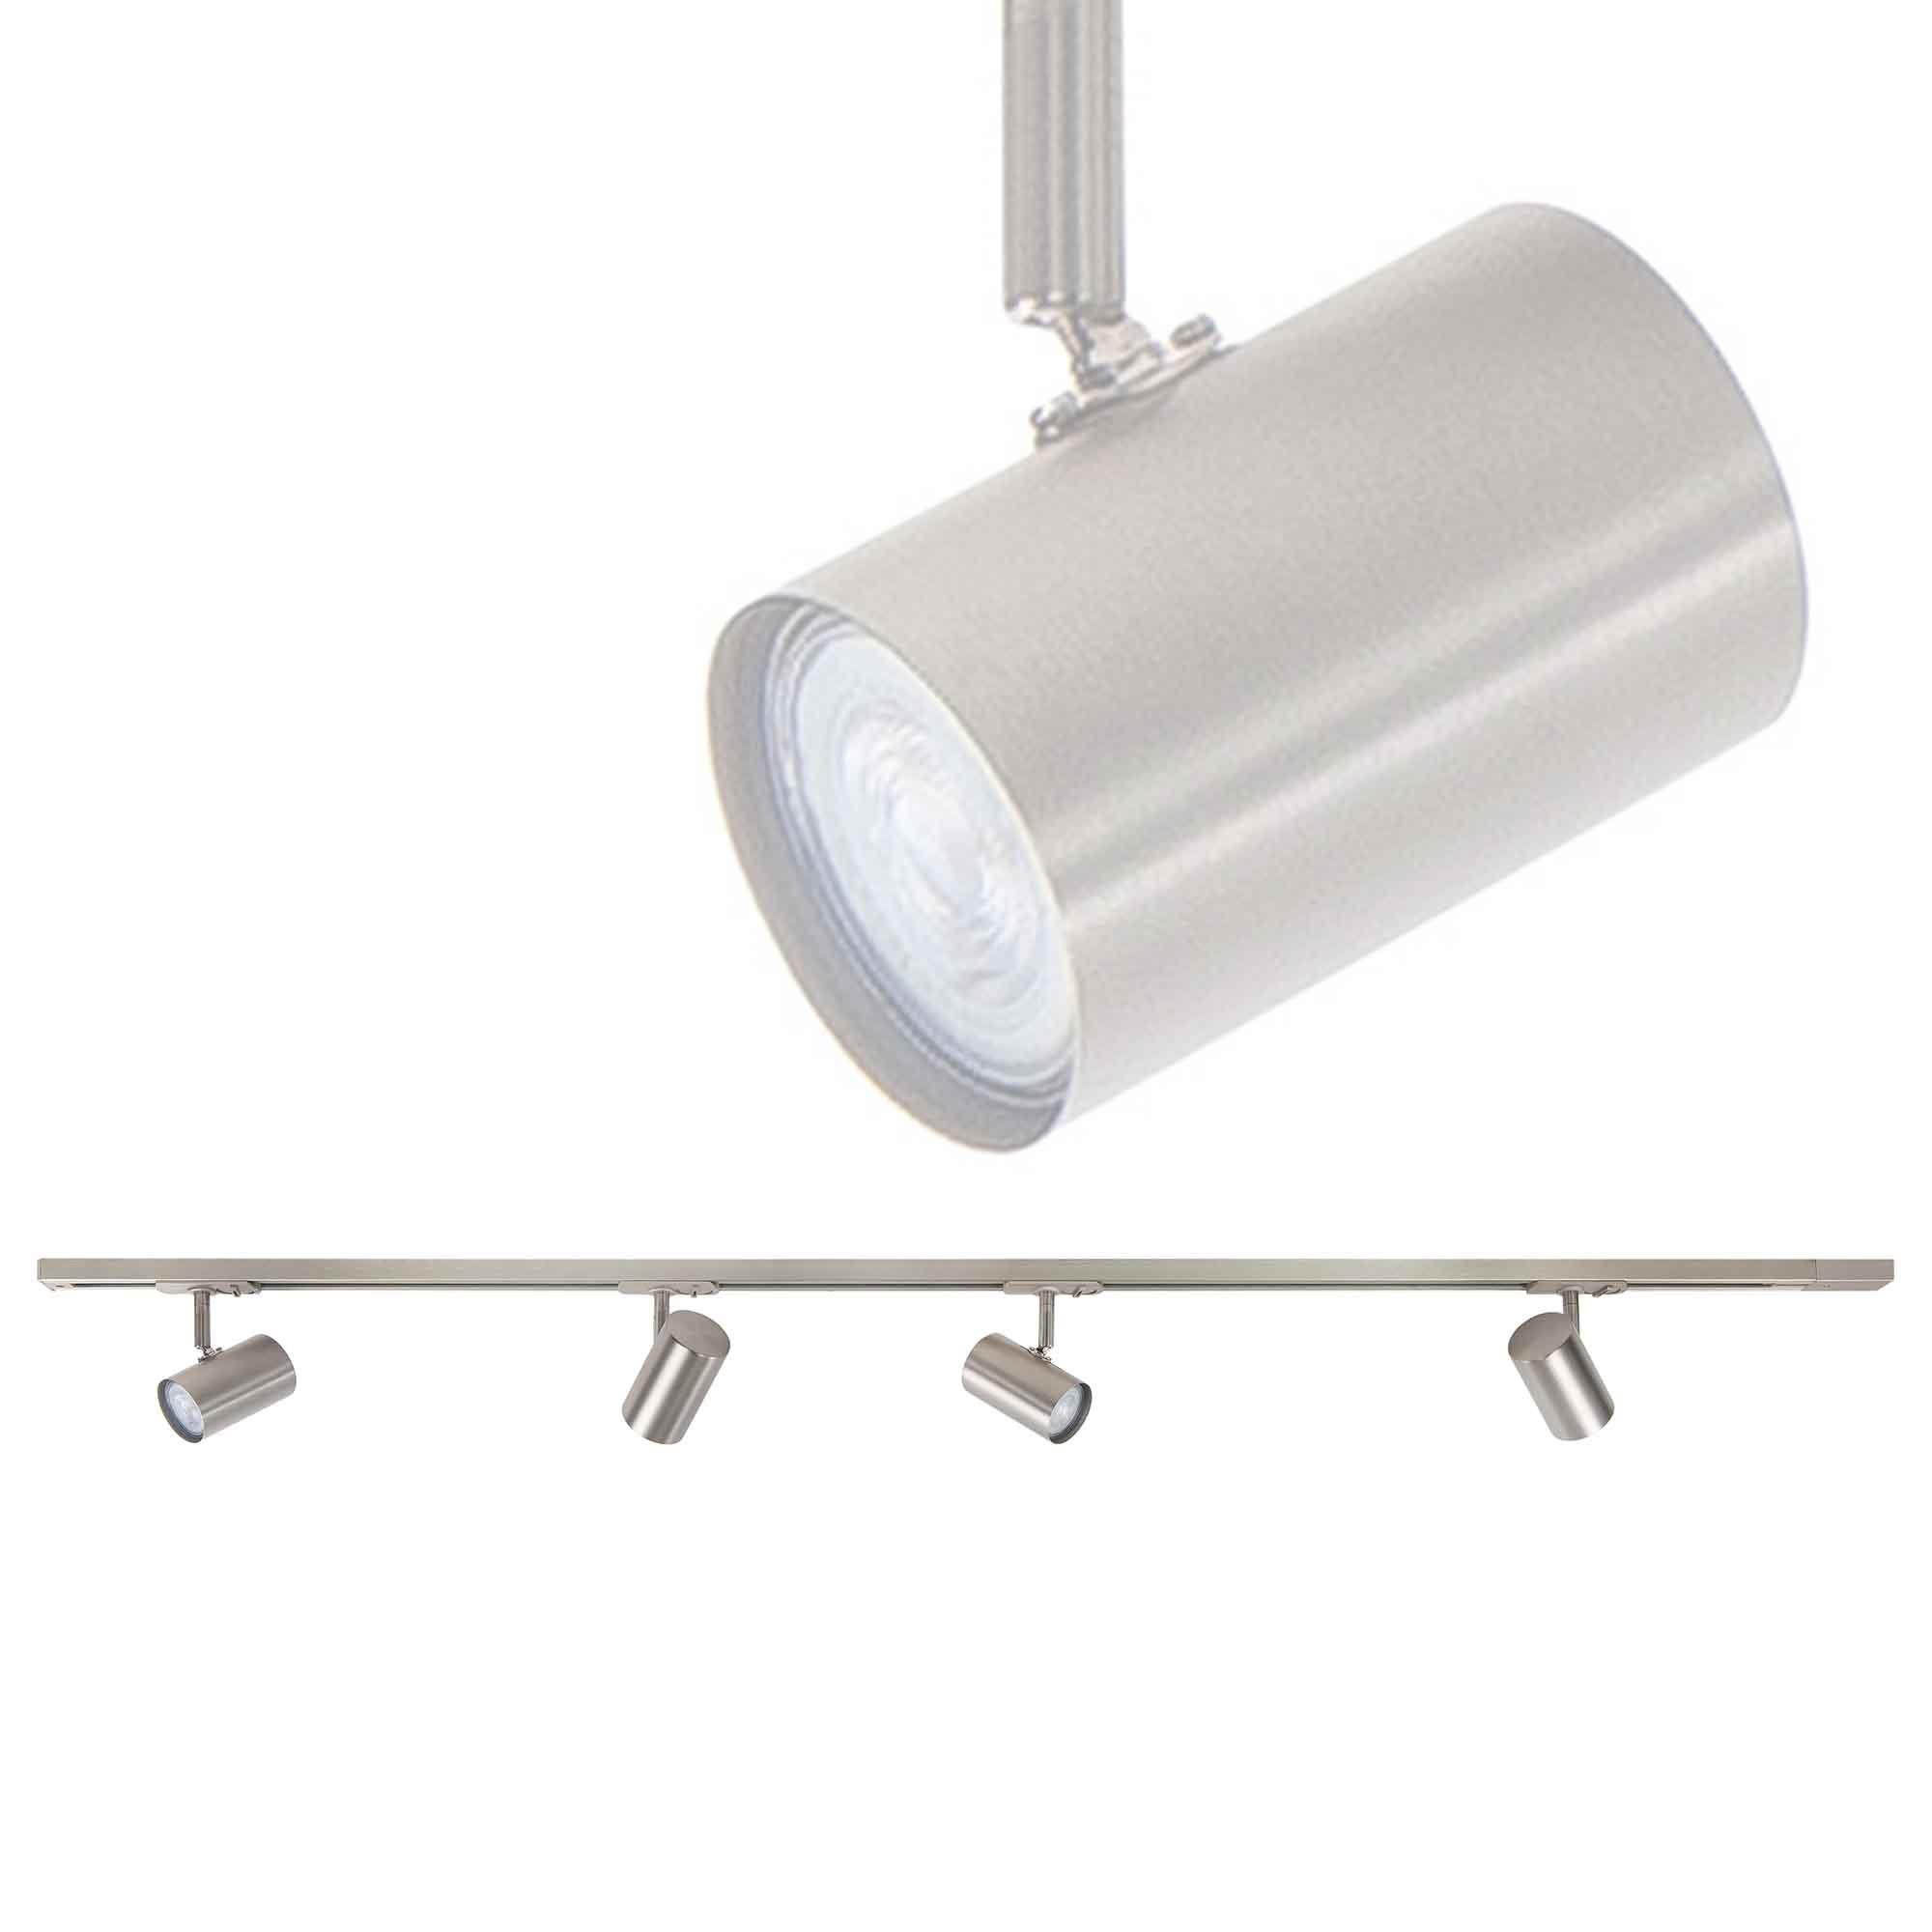 Highlight Railsysteem Trackline 150 cm + 4 cilinder spots mat chroom